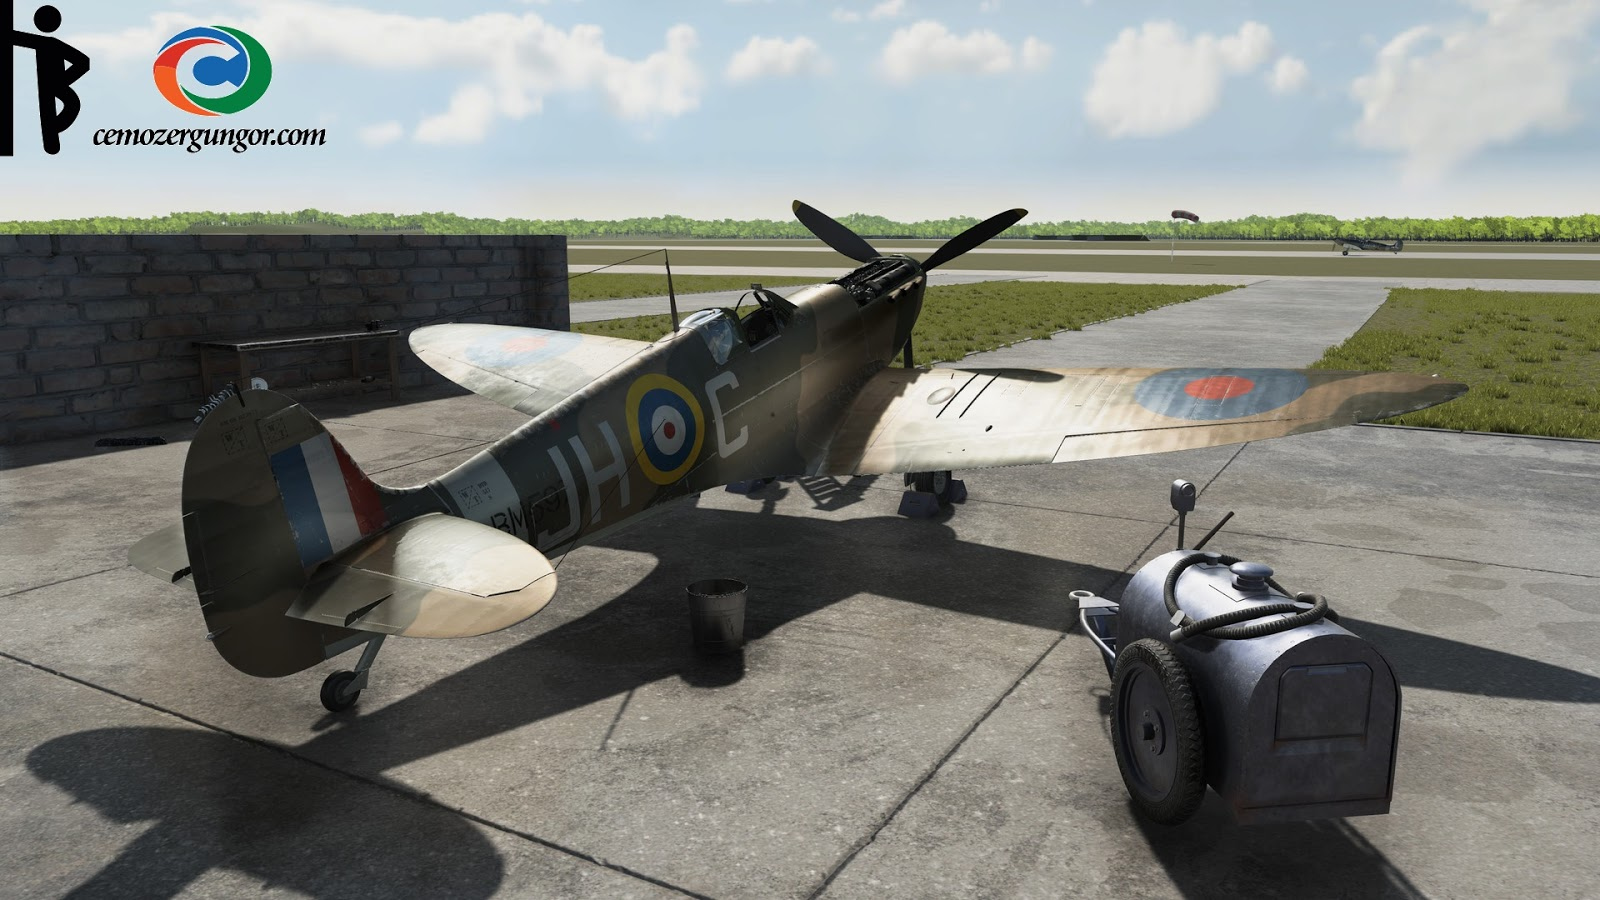 Plane Mechanic Simulator(Uçak Mekanik Simülasyon) PC Crack İndir